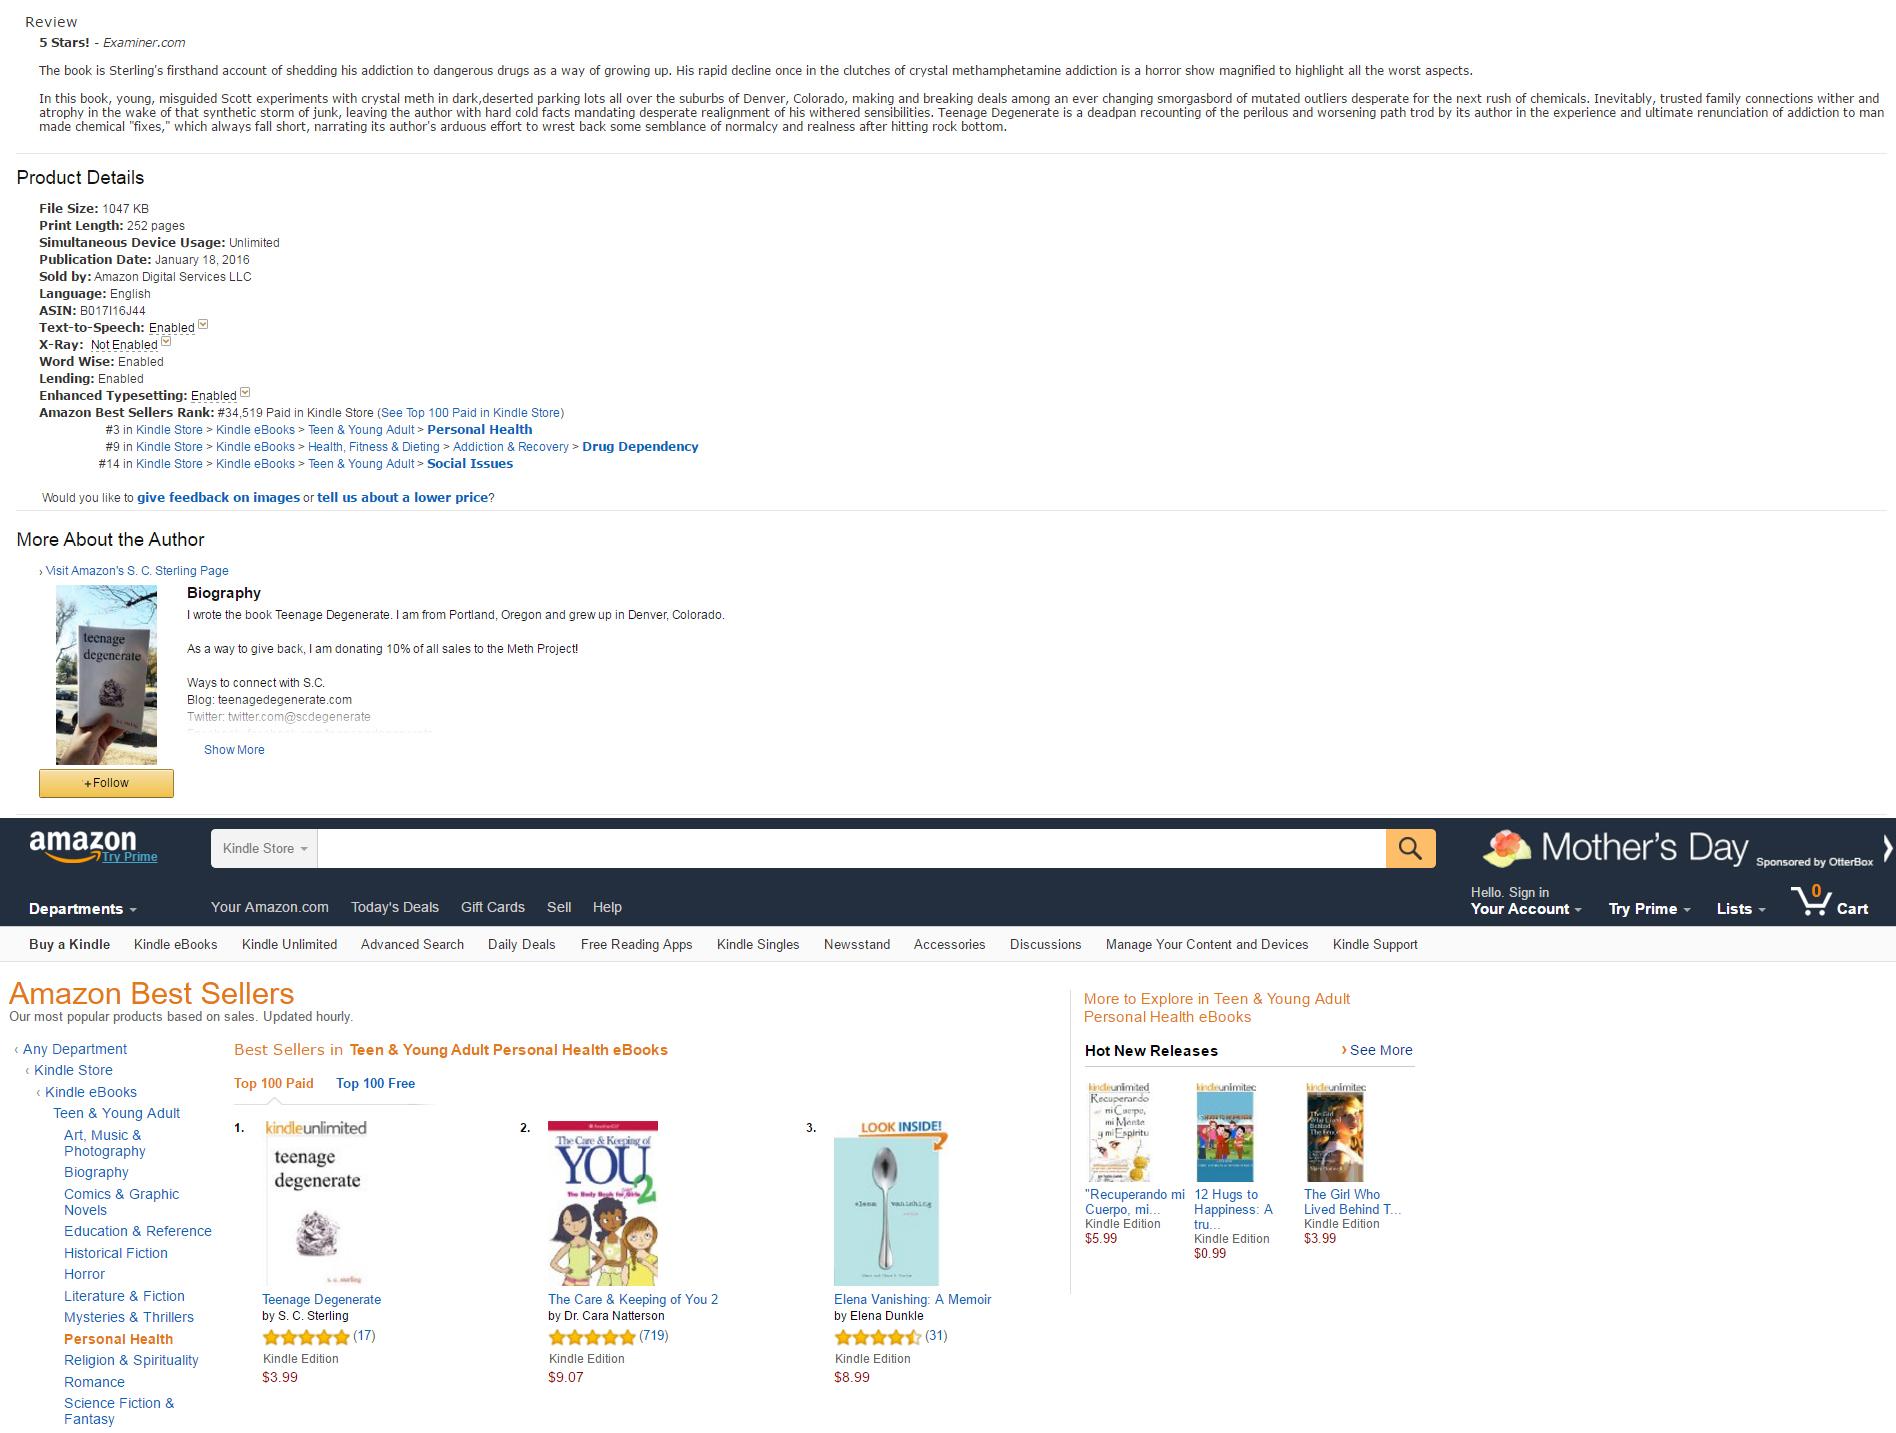 Teenage Degenerate broke into the top 35,000 books on Amazon!